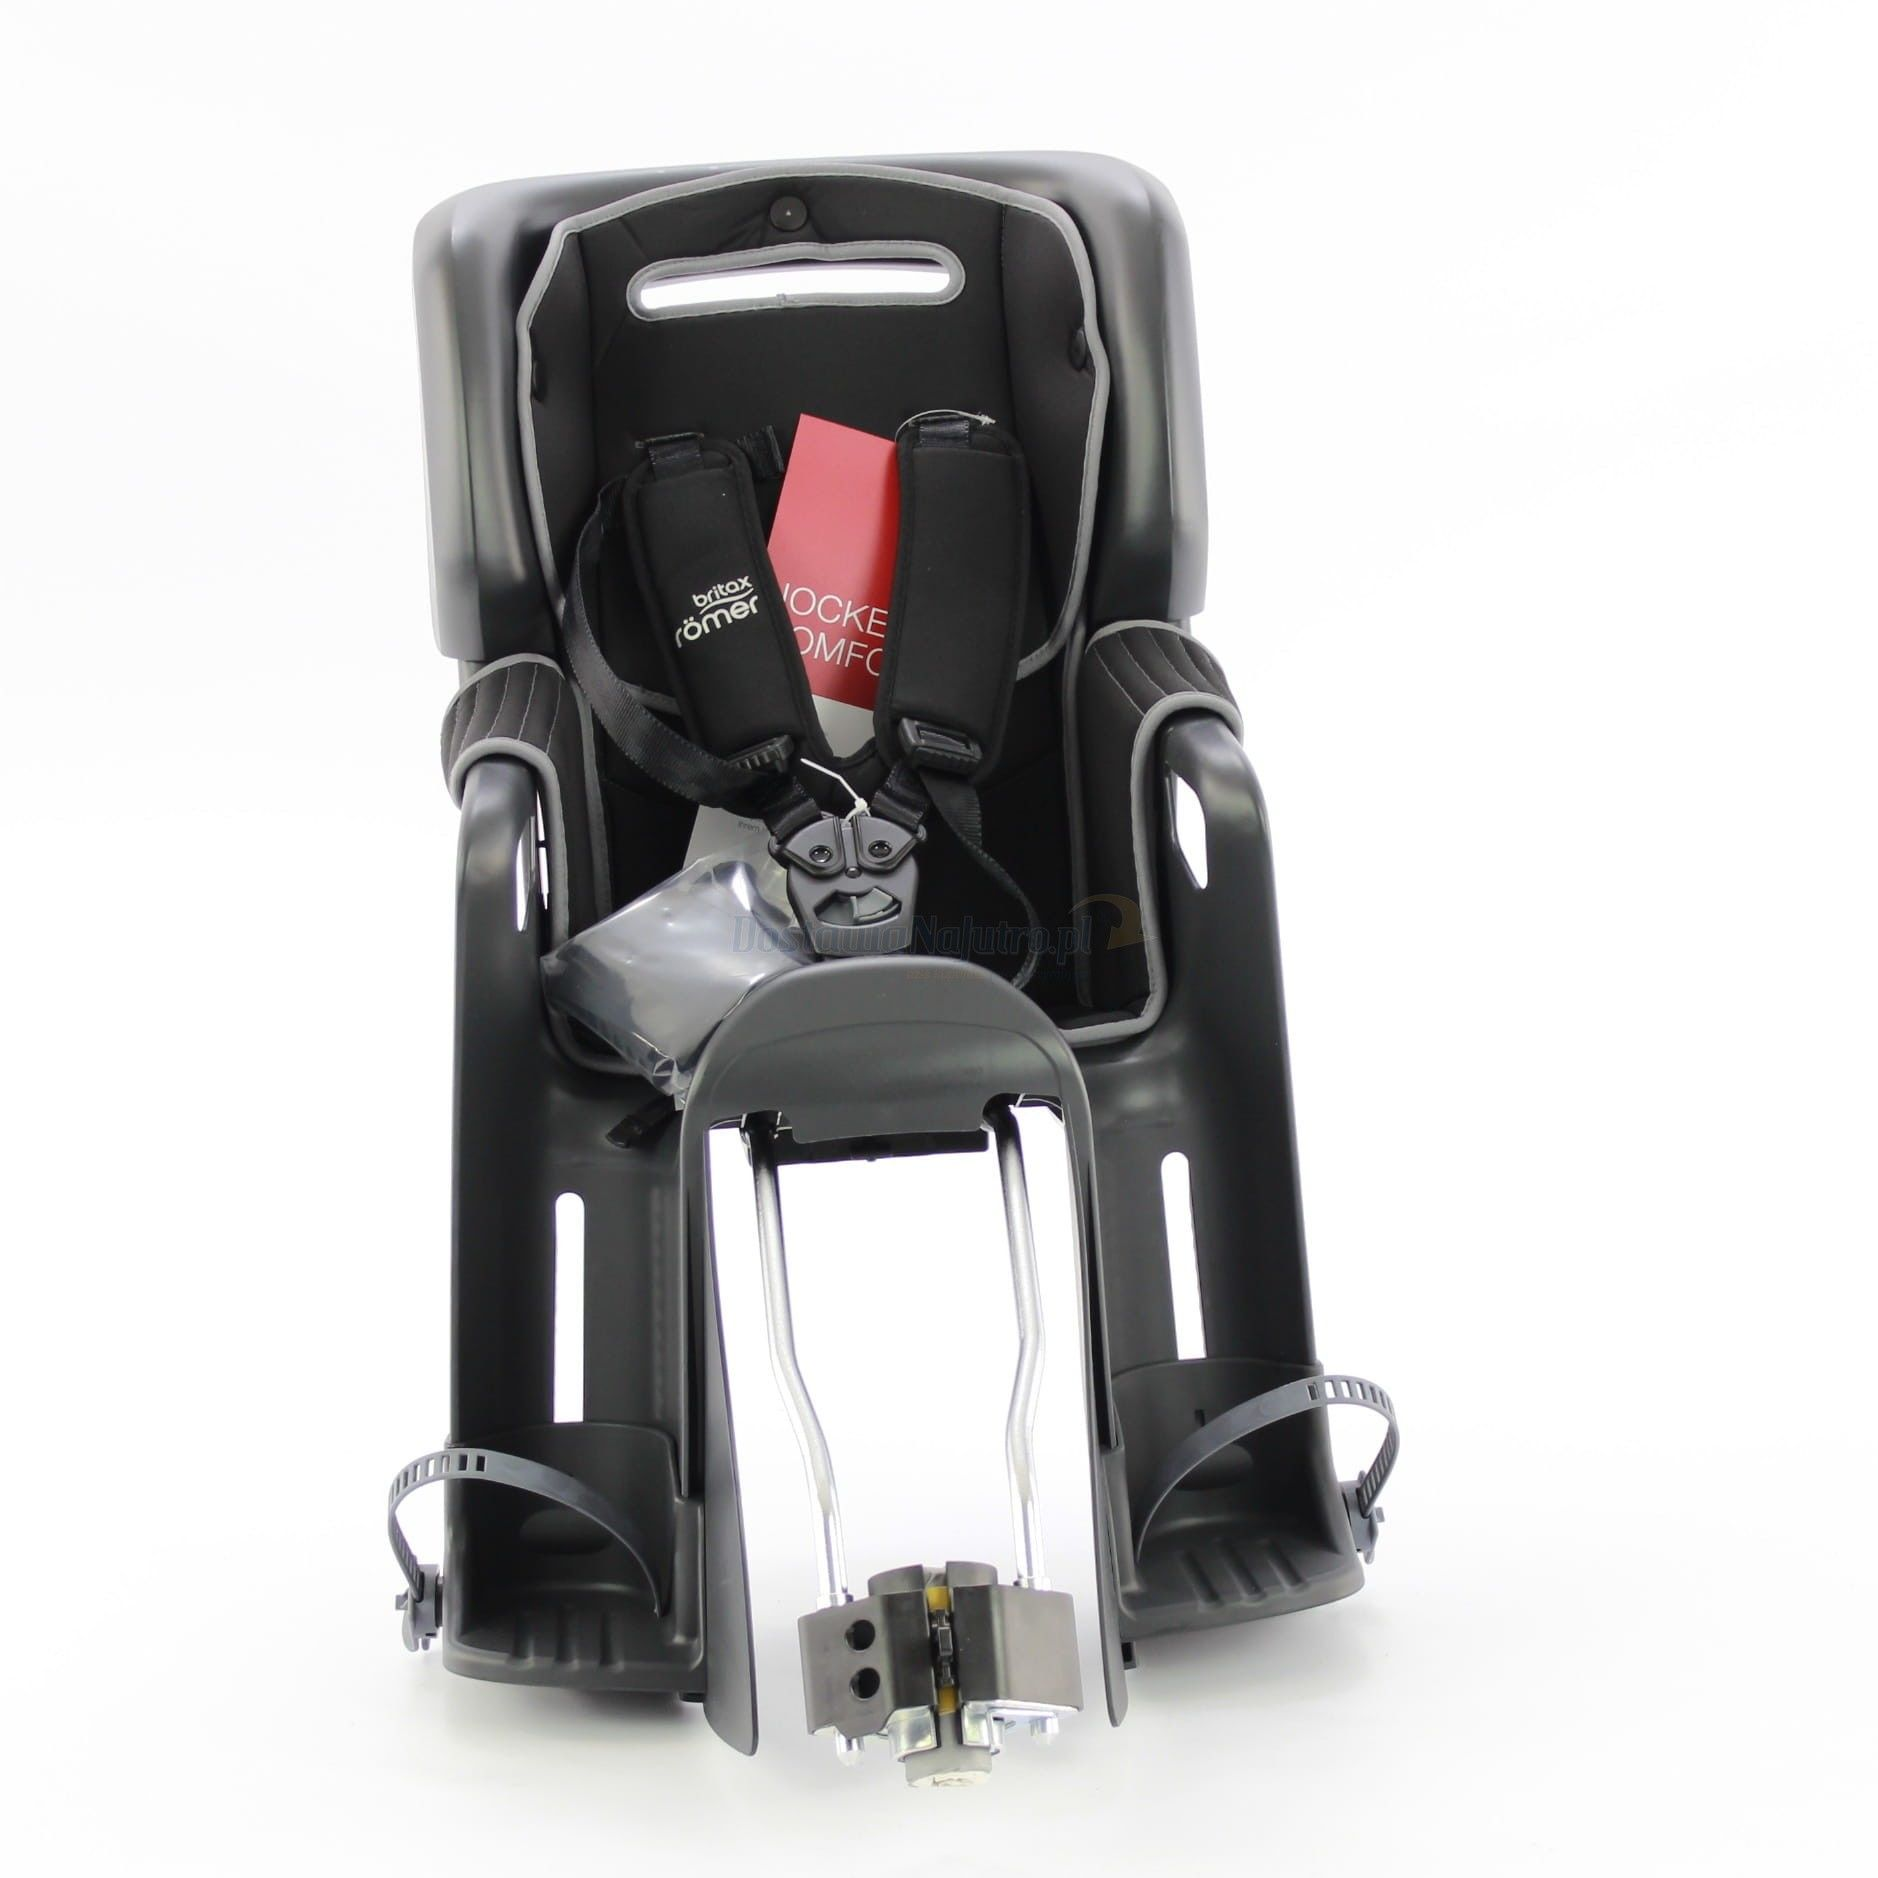 Fotelik rowerowy ROMER JOCKEY3 COMFORT BRITAX- kolor szaro czarny 2020